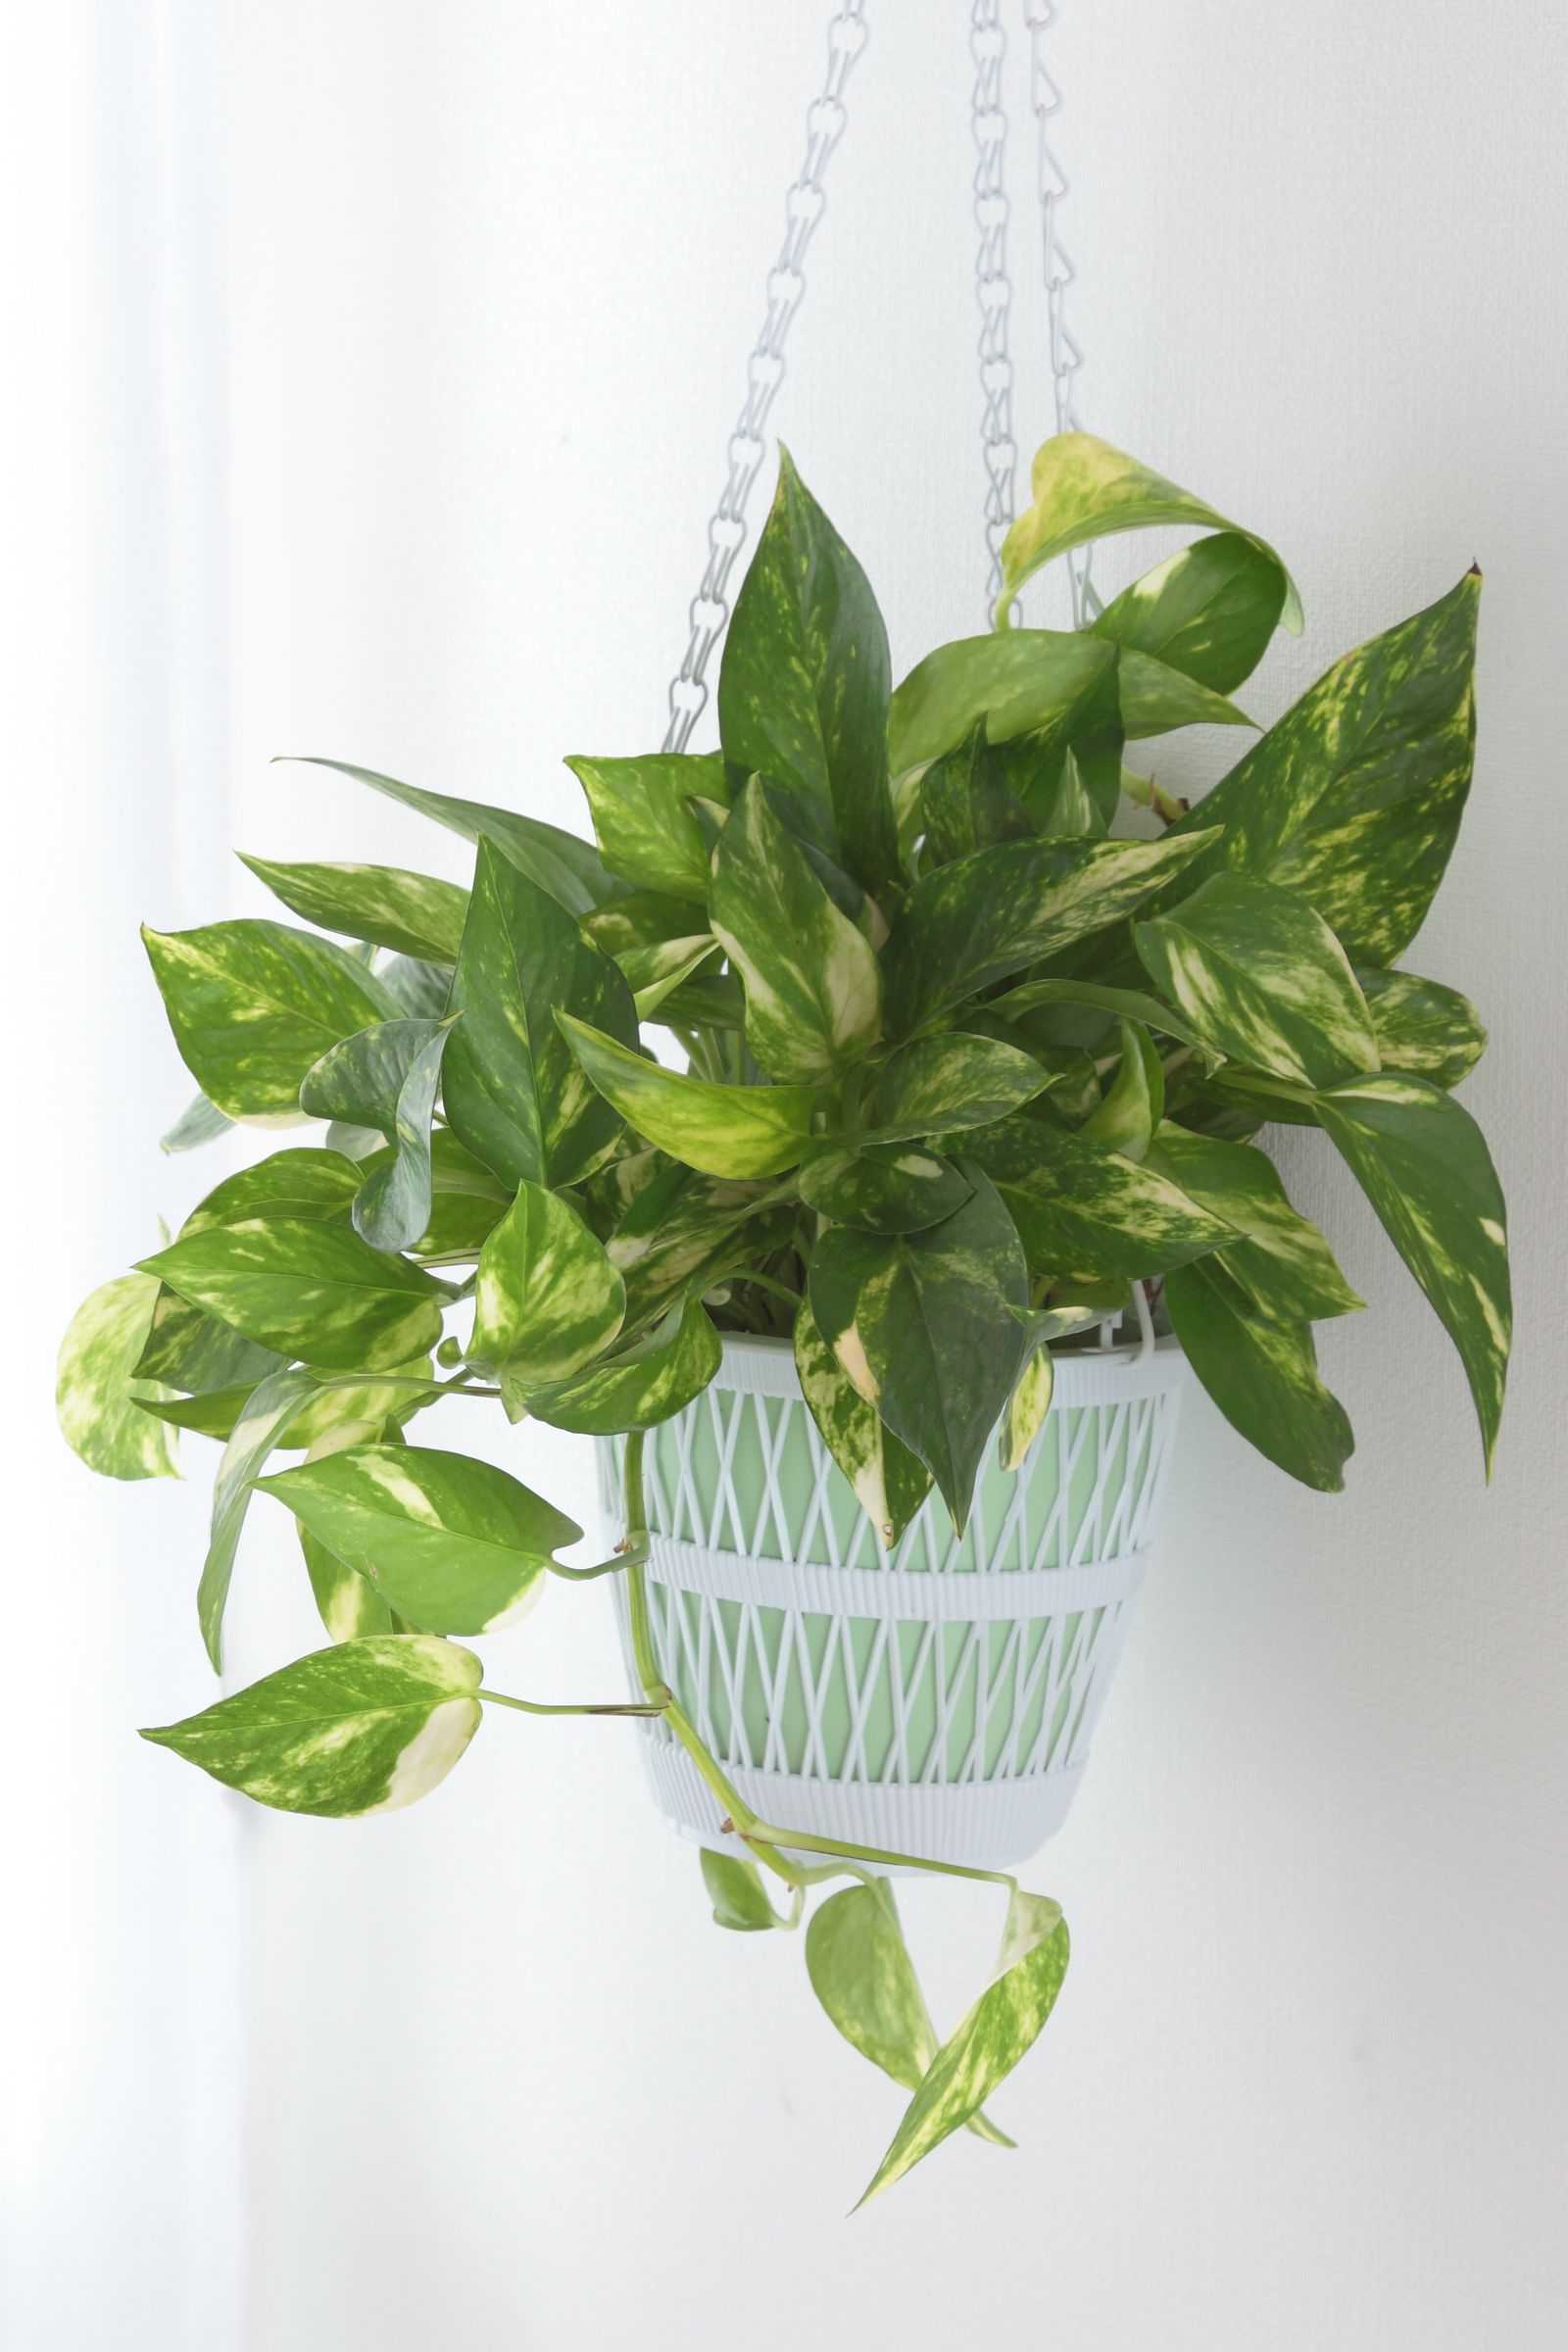 Pothosgoodhousemag Indoor Plants Bathroom Hanging Plants Indoor Indoor Plants